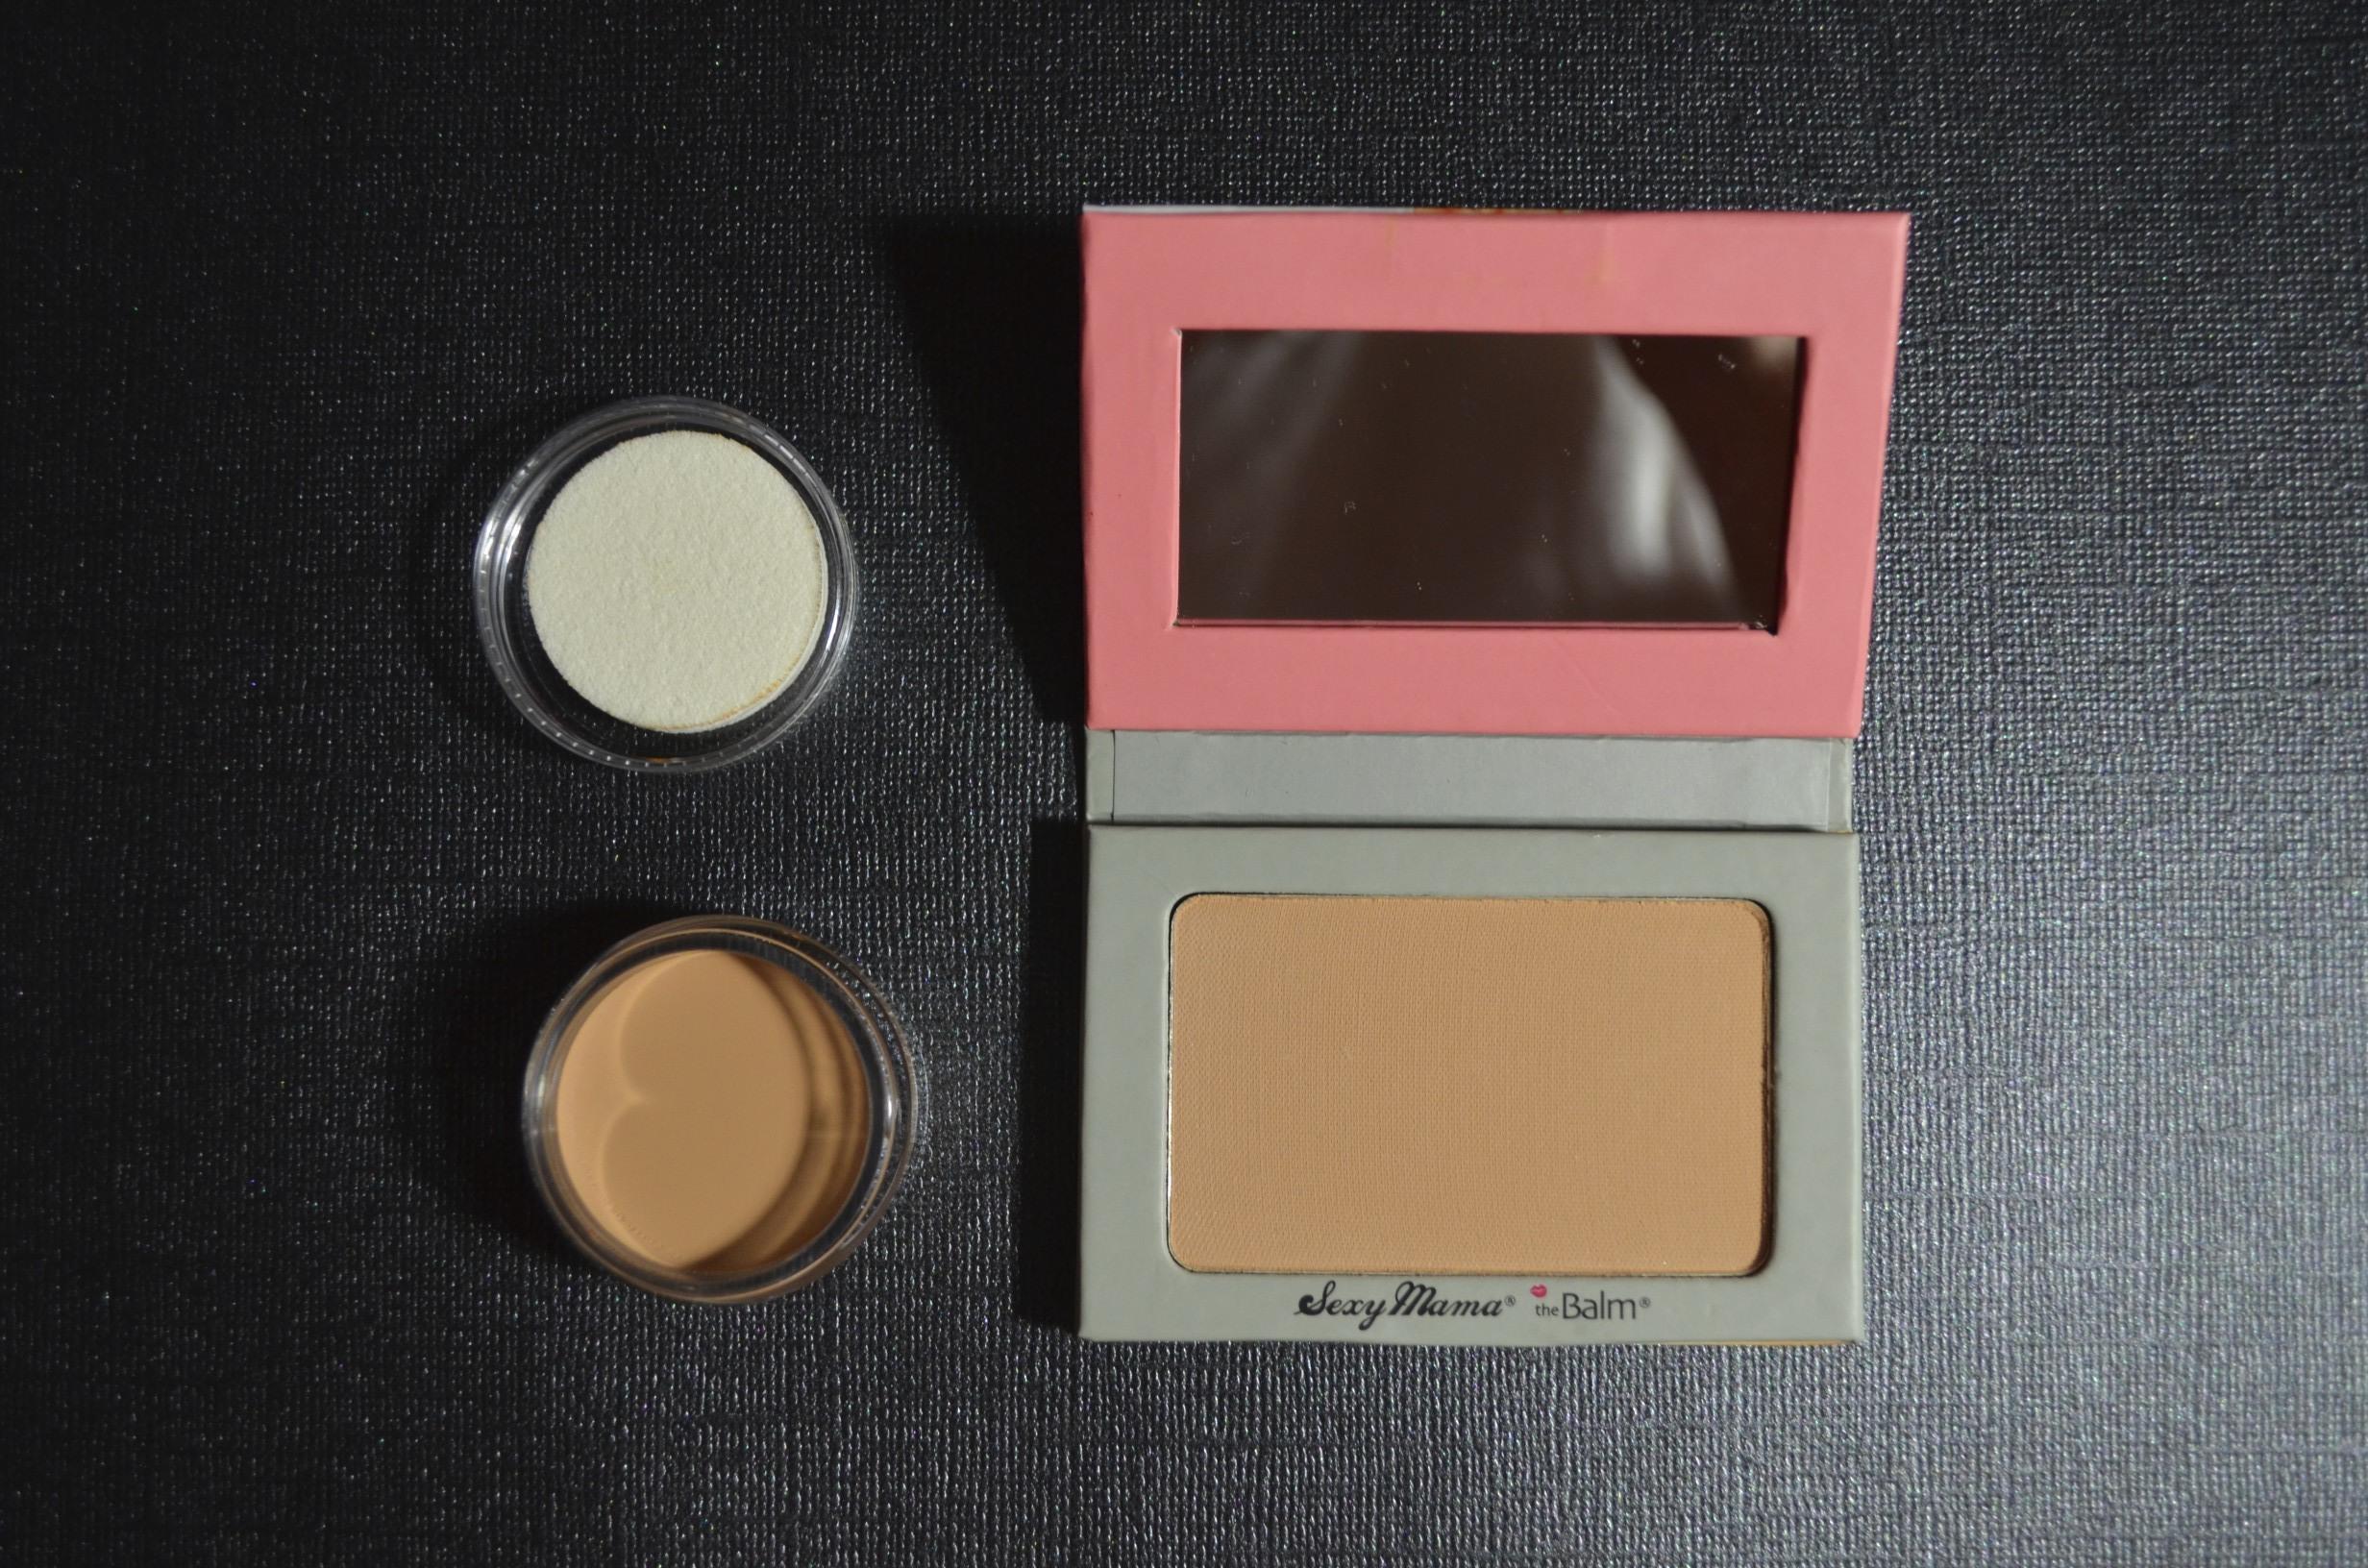 thebalm powder, thebalm concealer